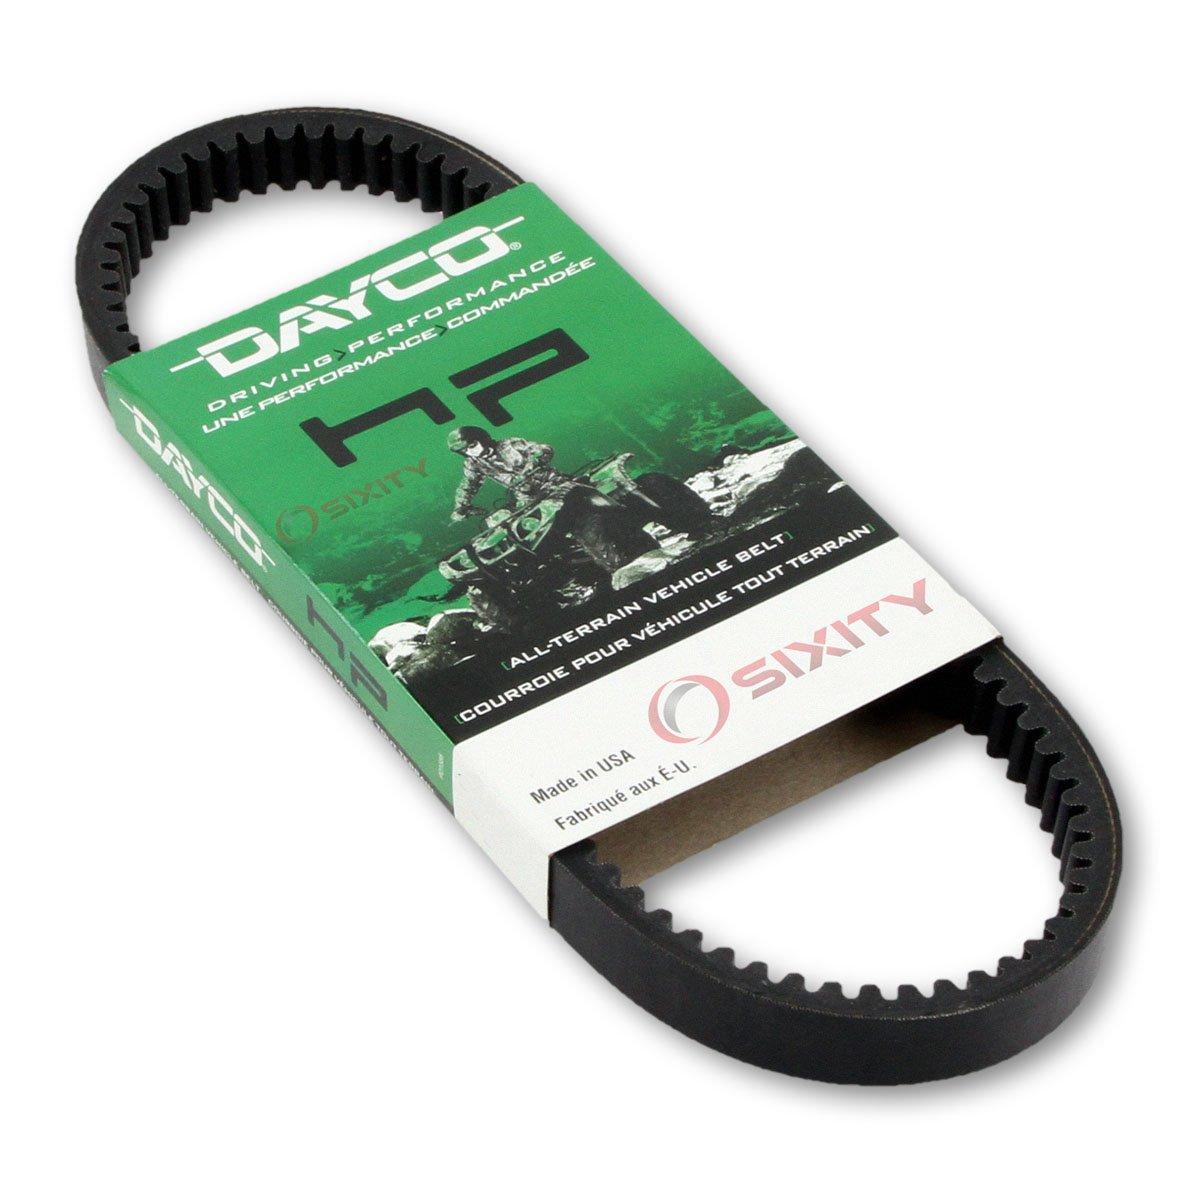 2001-2006 Polaris Sportsman 500 HO Drive Belt Dayco HP ATV OEM Upgrade Replacement Transmission Belts